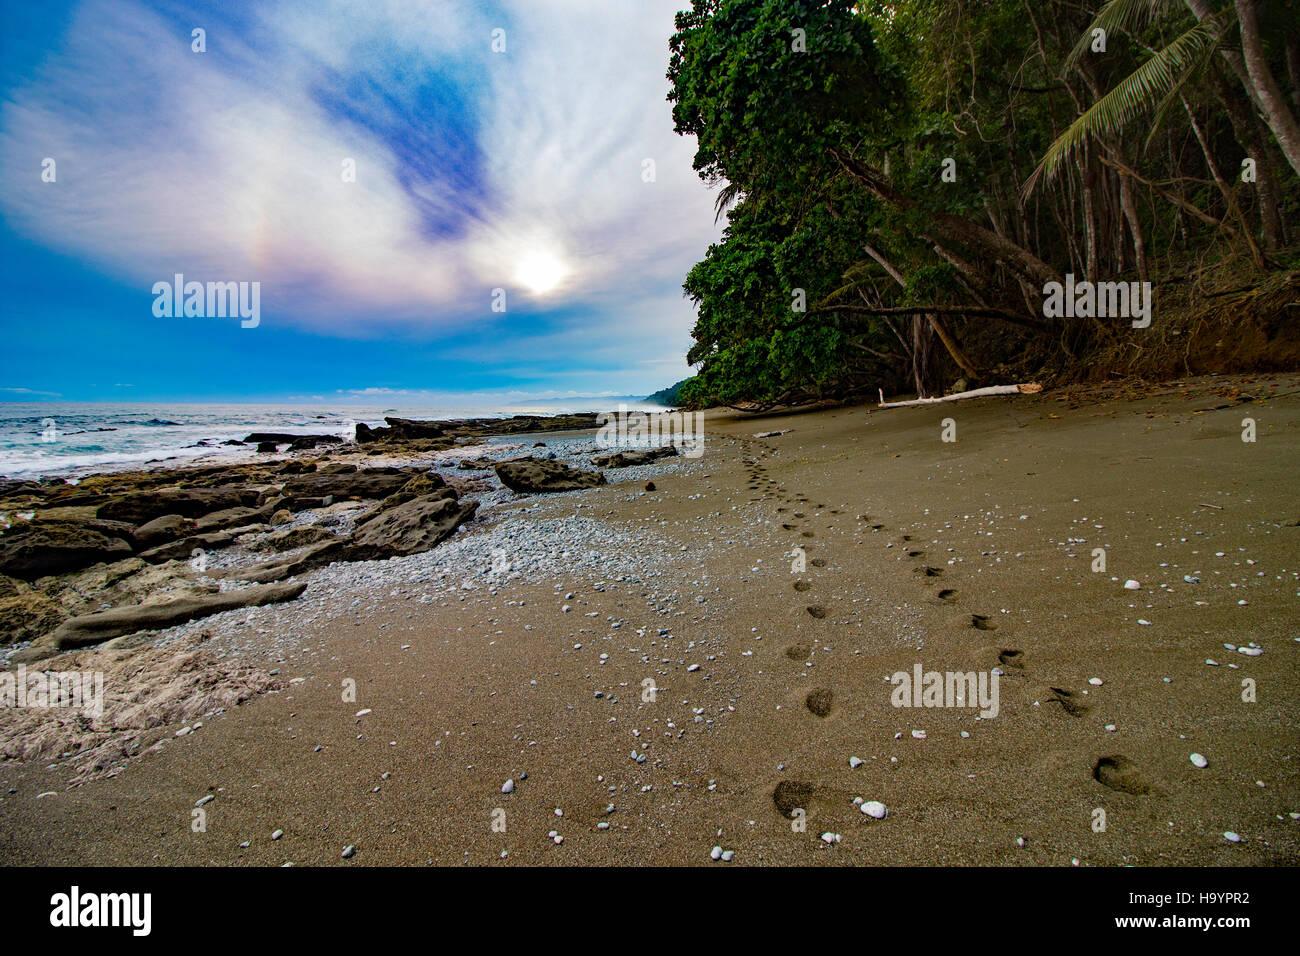 Costa Rican Beach, Osa Peninsula - Stock Image